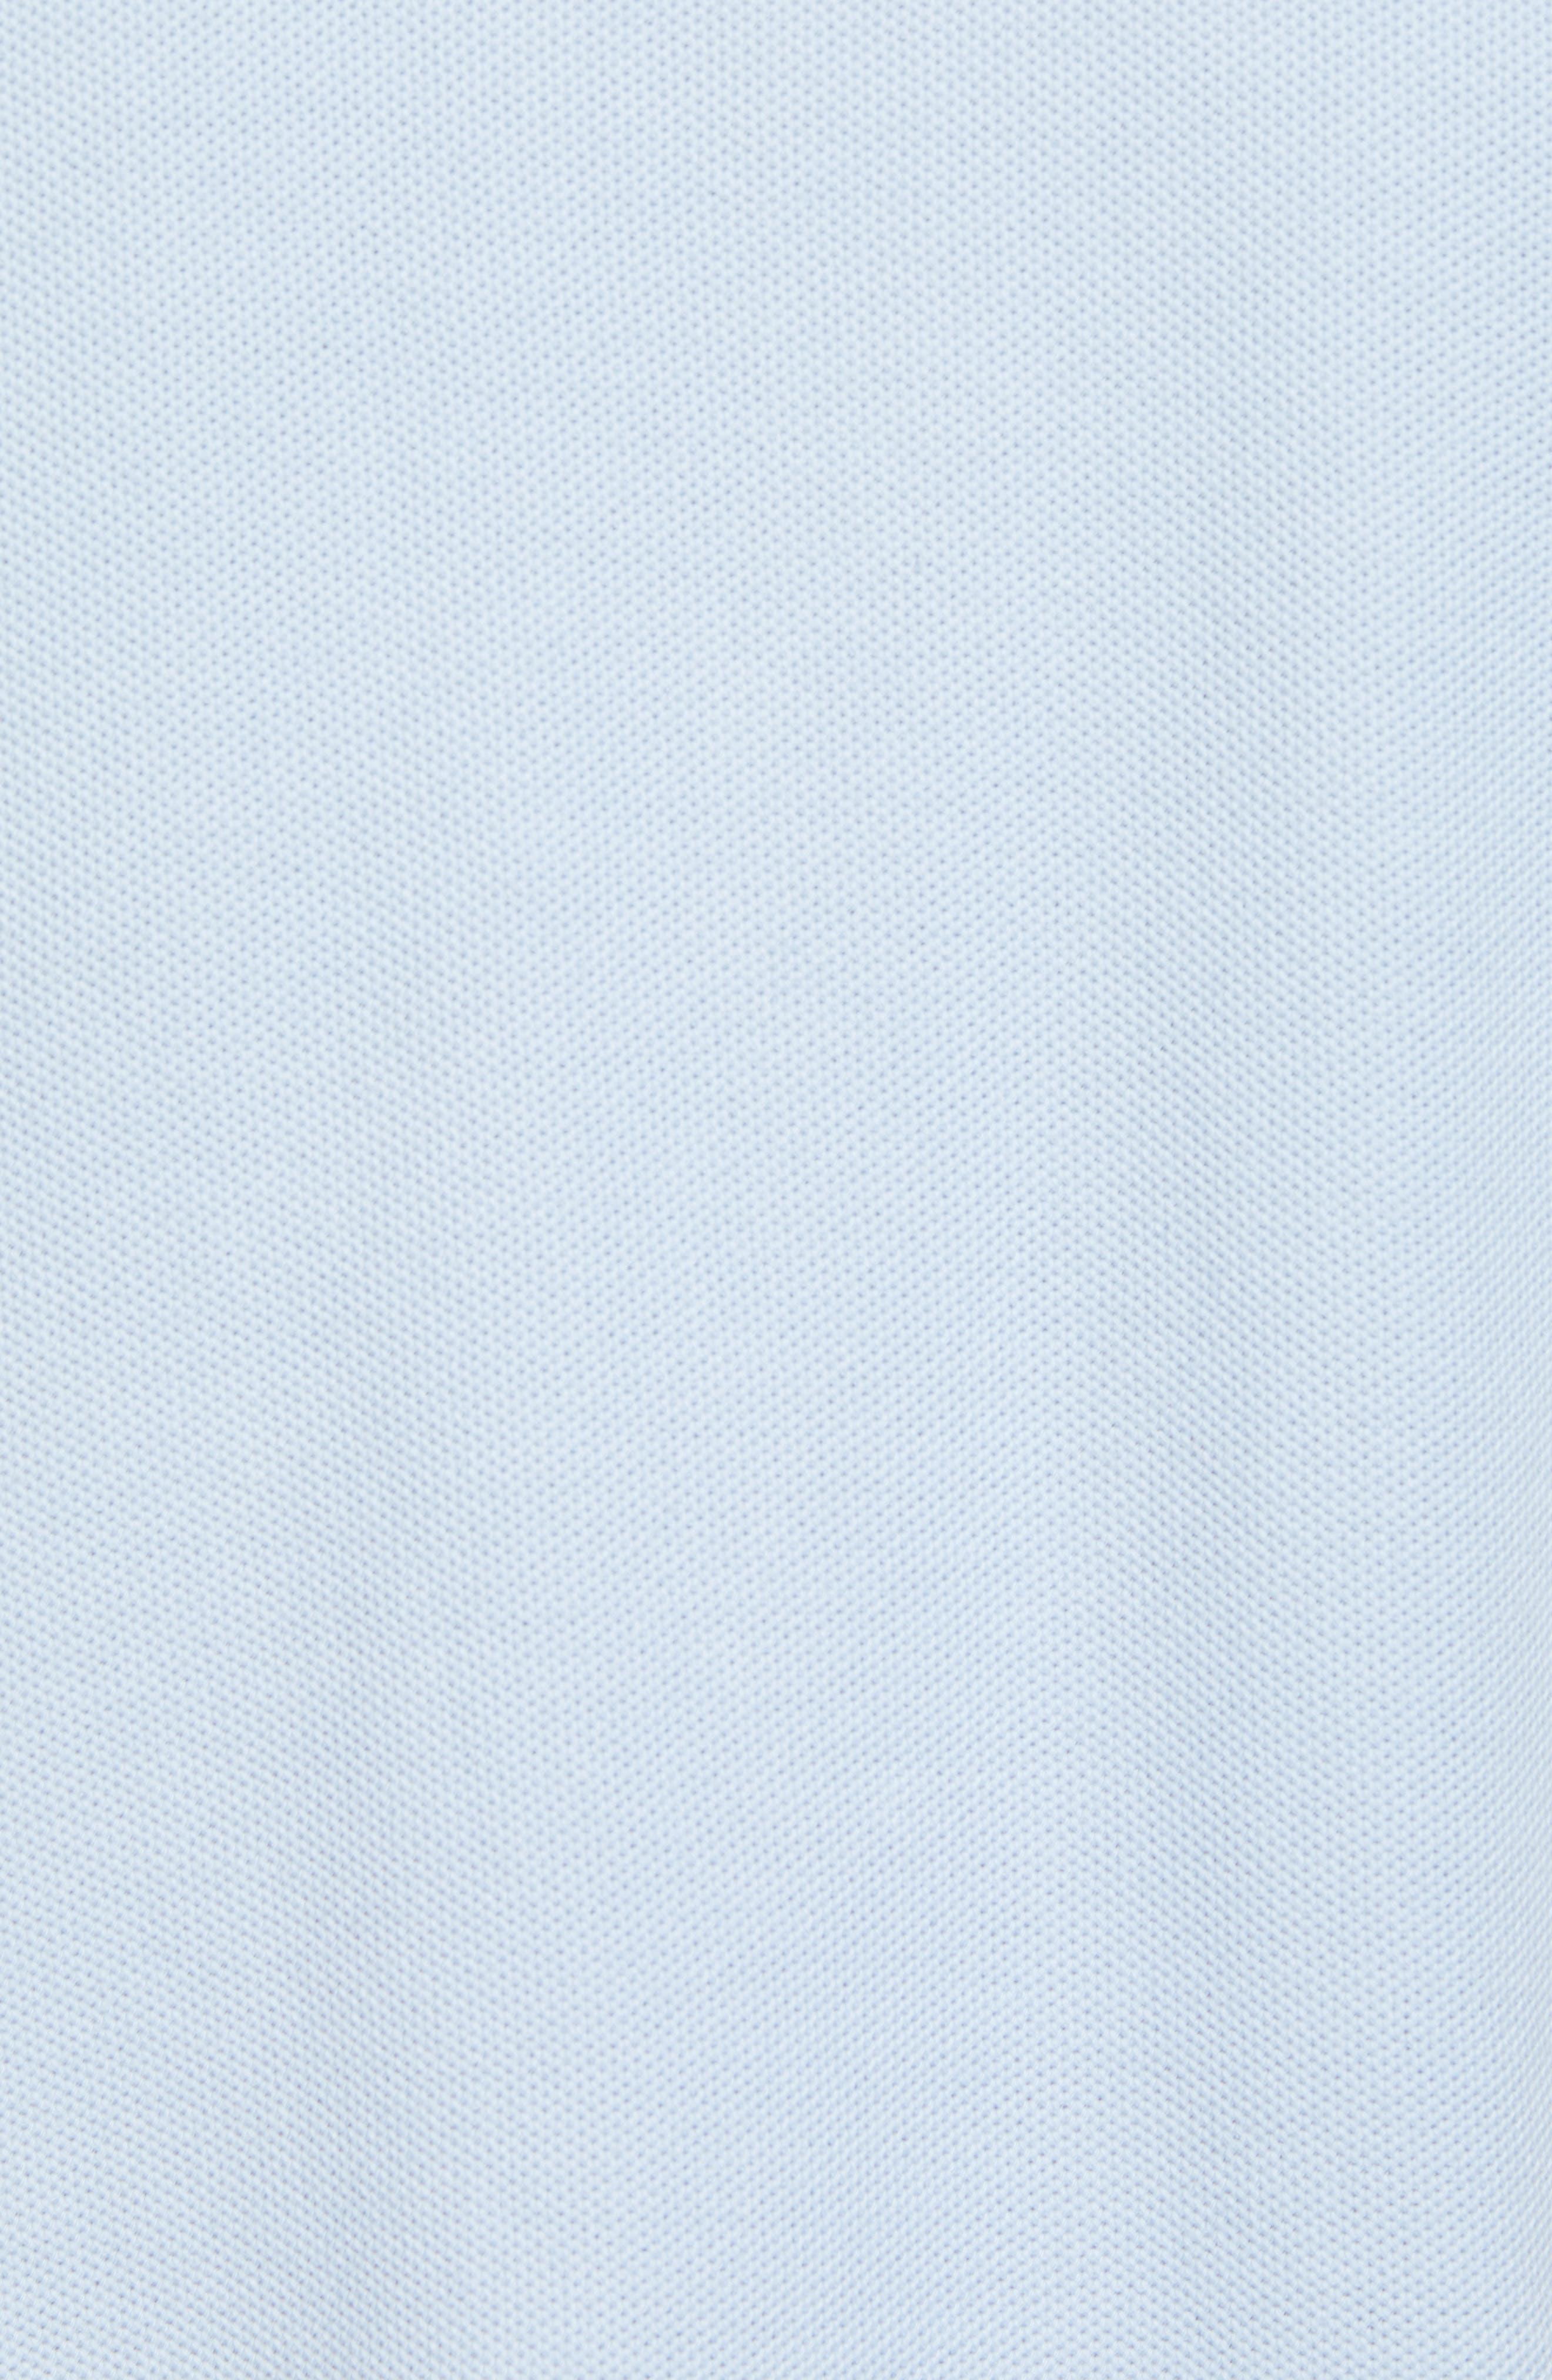 Regular Fit Polo,                             Alternate thumbnail 5, color,                             400